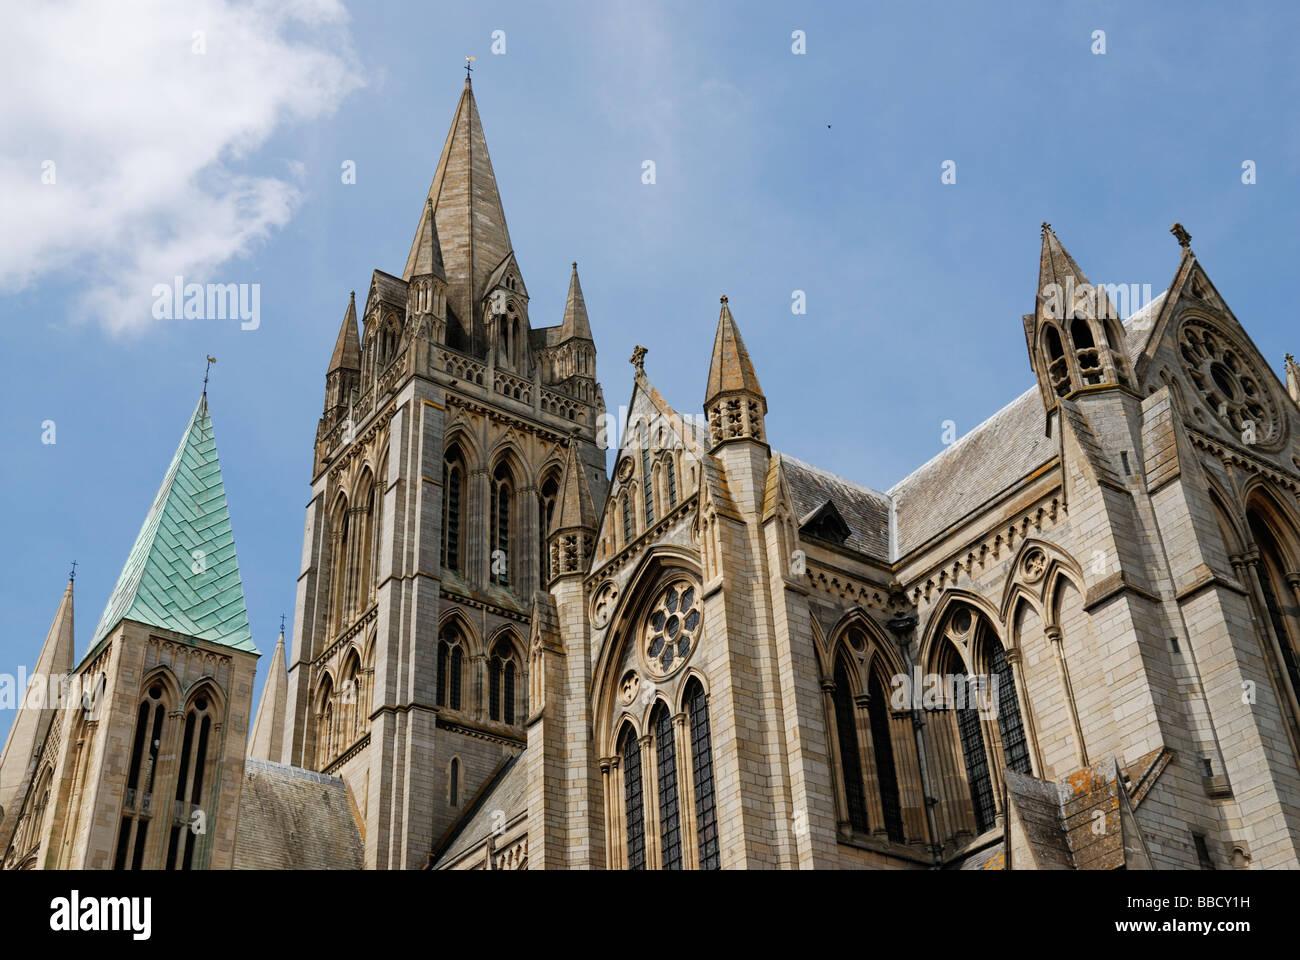 Truro Cathedral, Truro, Cornwall, UK, Europe - Stock Image